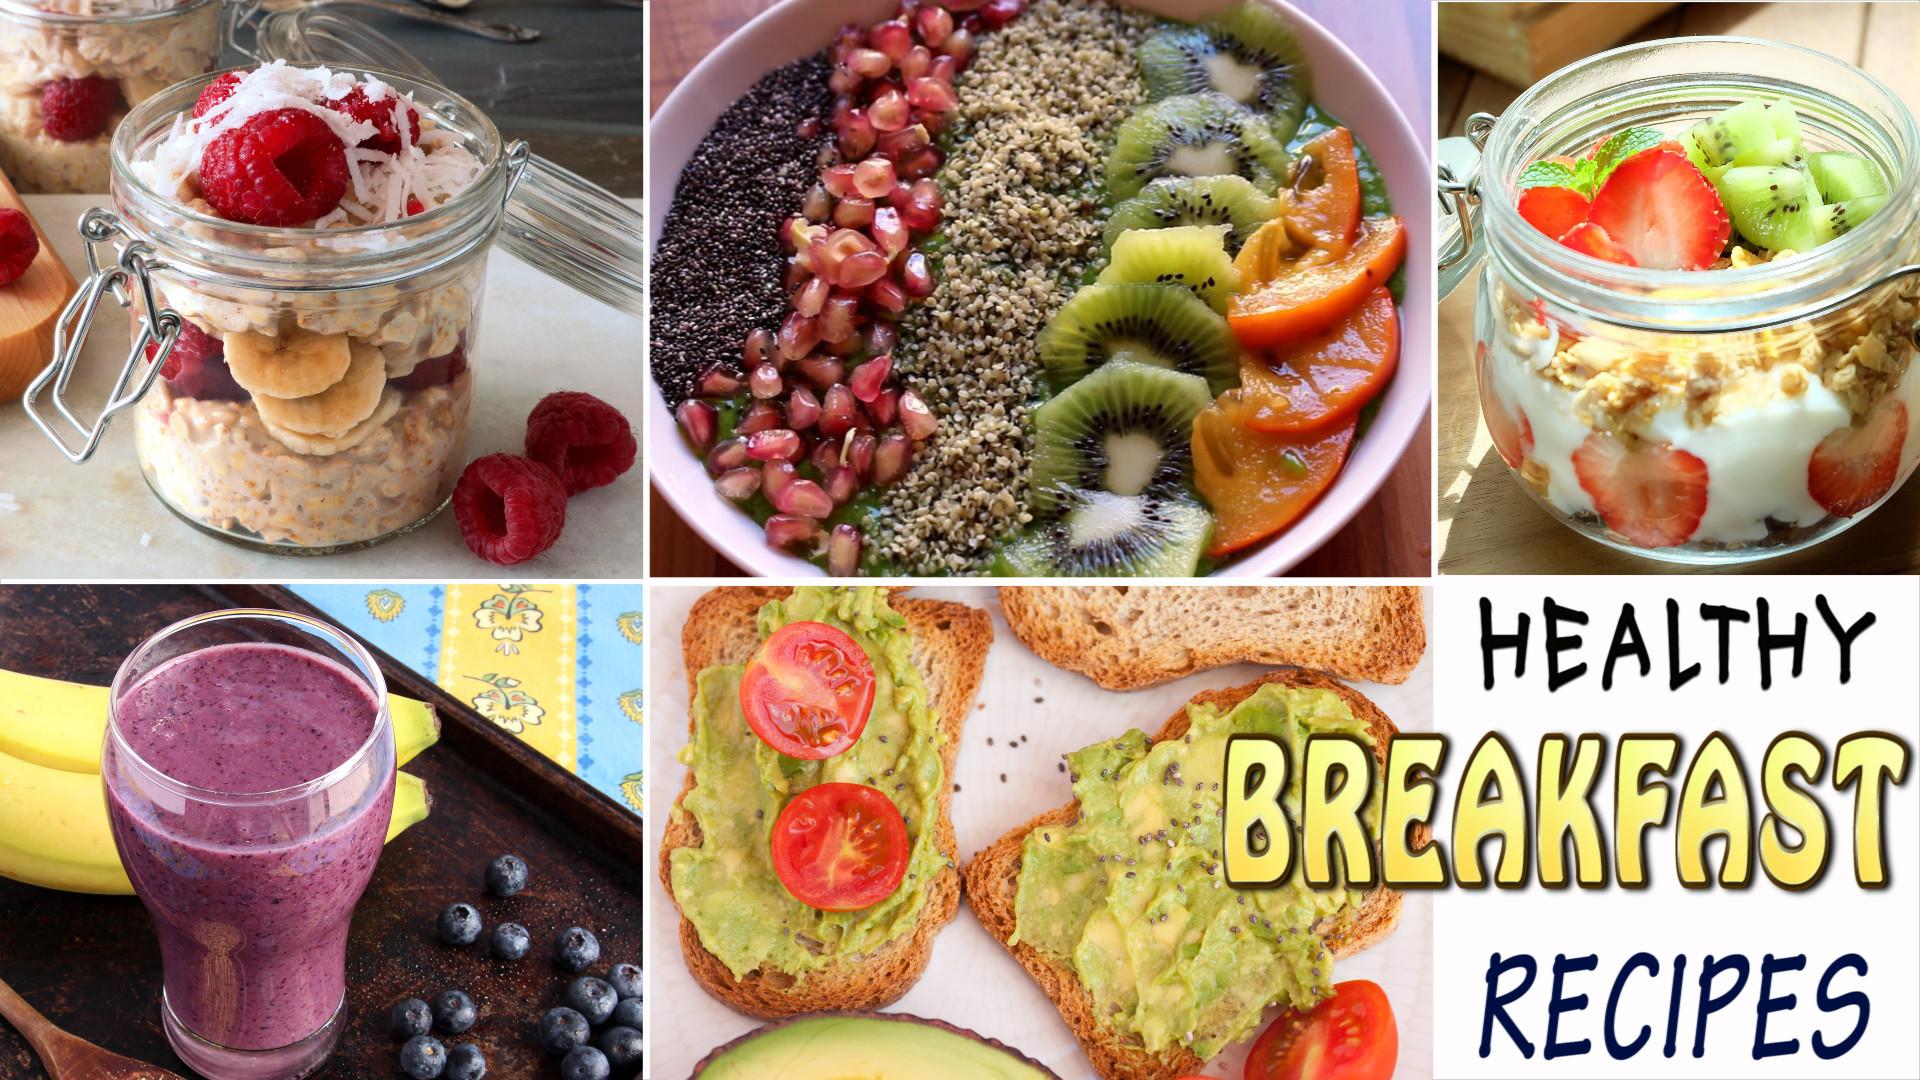 Healthy Vegetarian Breakfast Recipes  My 8 Favorite Healthy Vegan Breakfast Recipes